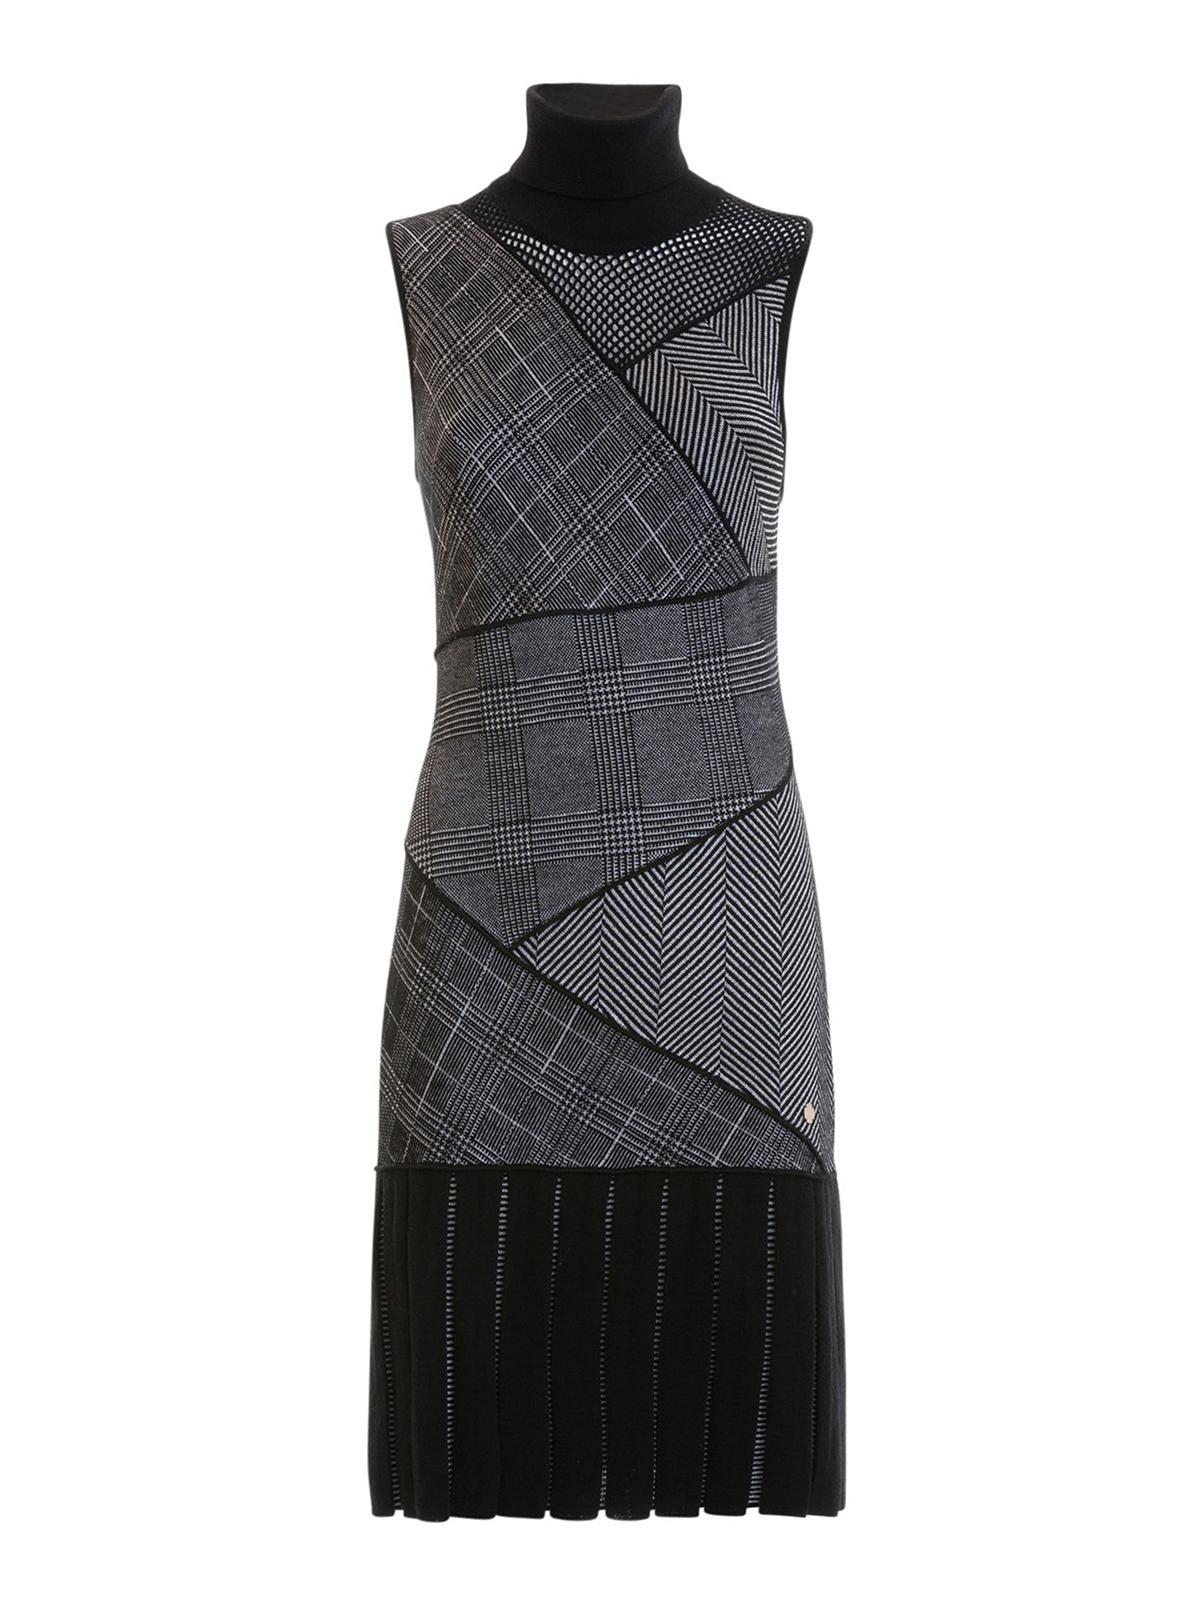 Kleider Collection Knielanges Kleid Knielange Versace Grau b7vfg6Yy